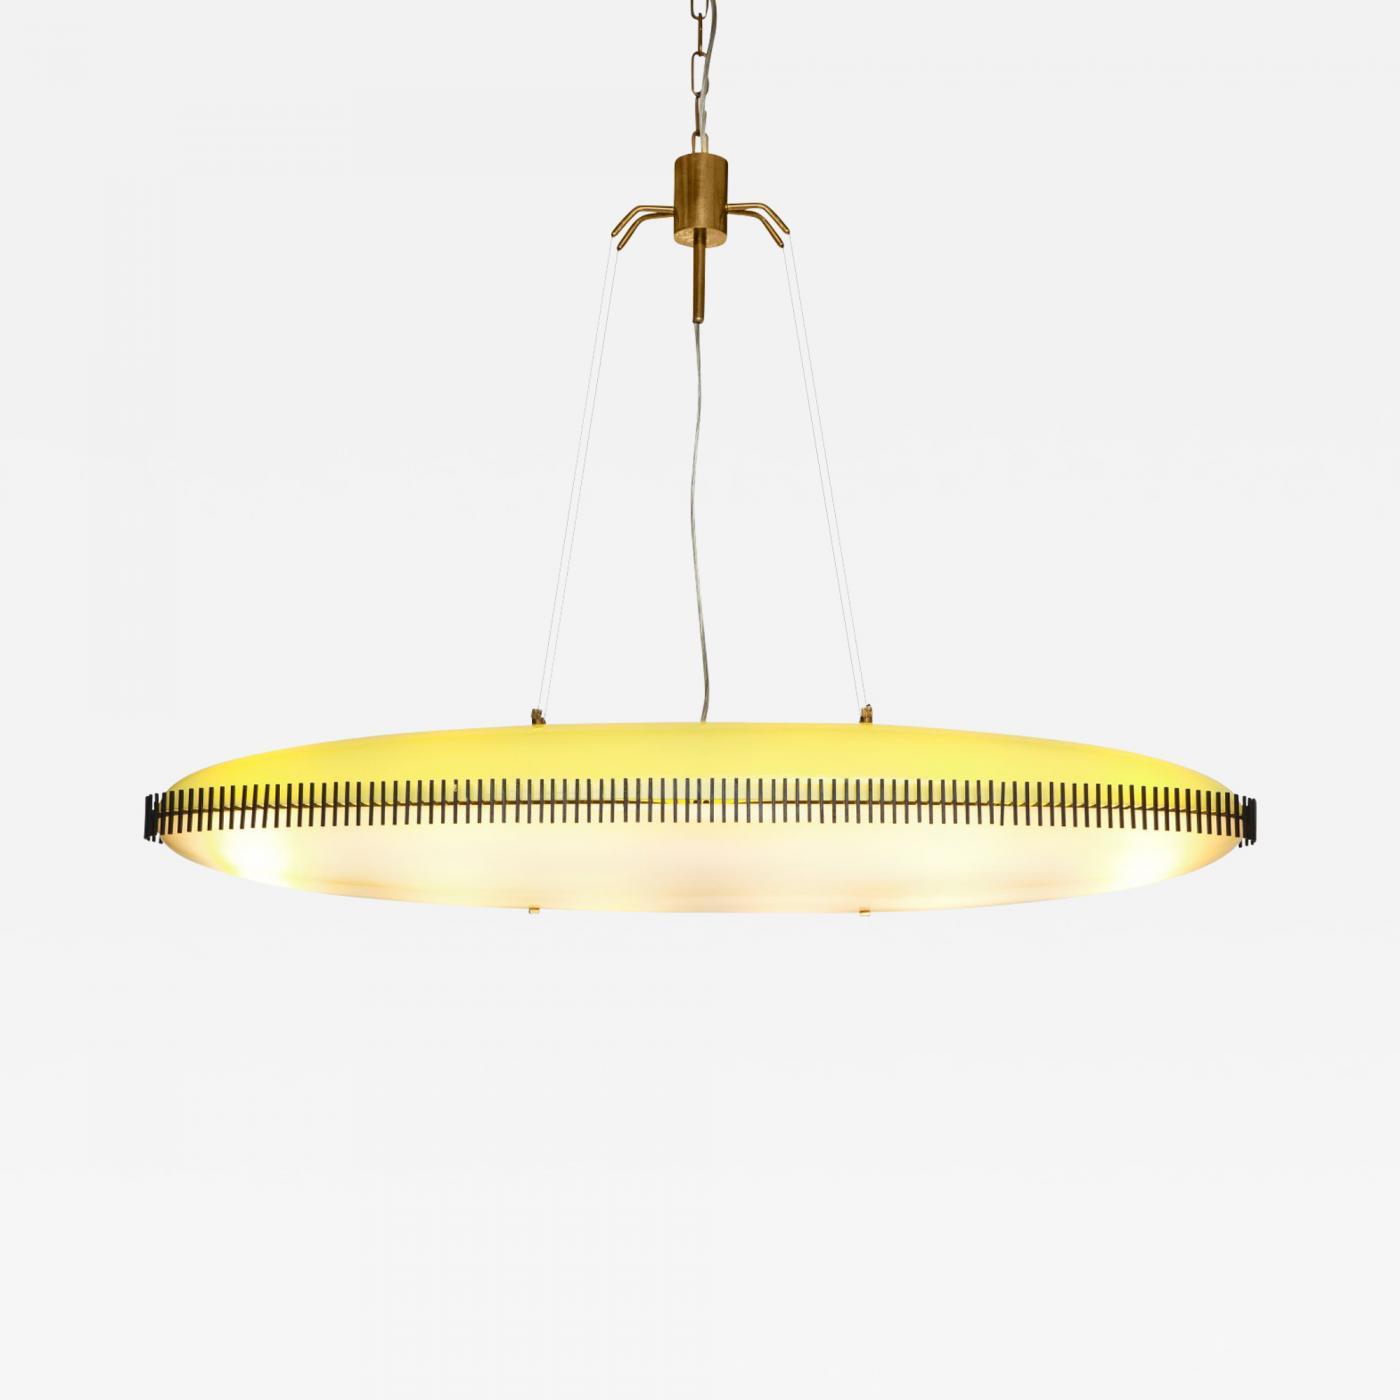 Angelo lelli rare yellow white chandelier by angelo lelli listings furniture lighting chandeliers and pendants aloadofball Gallery